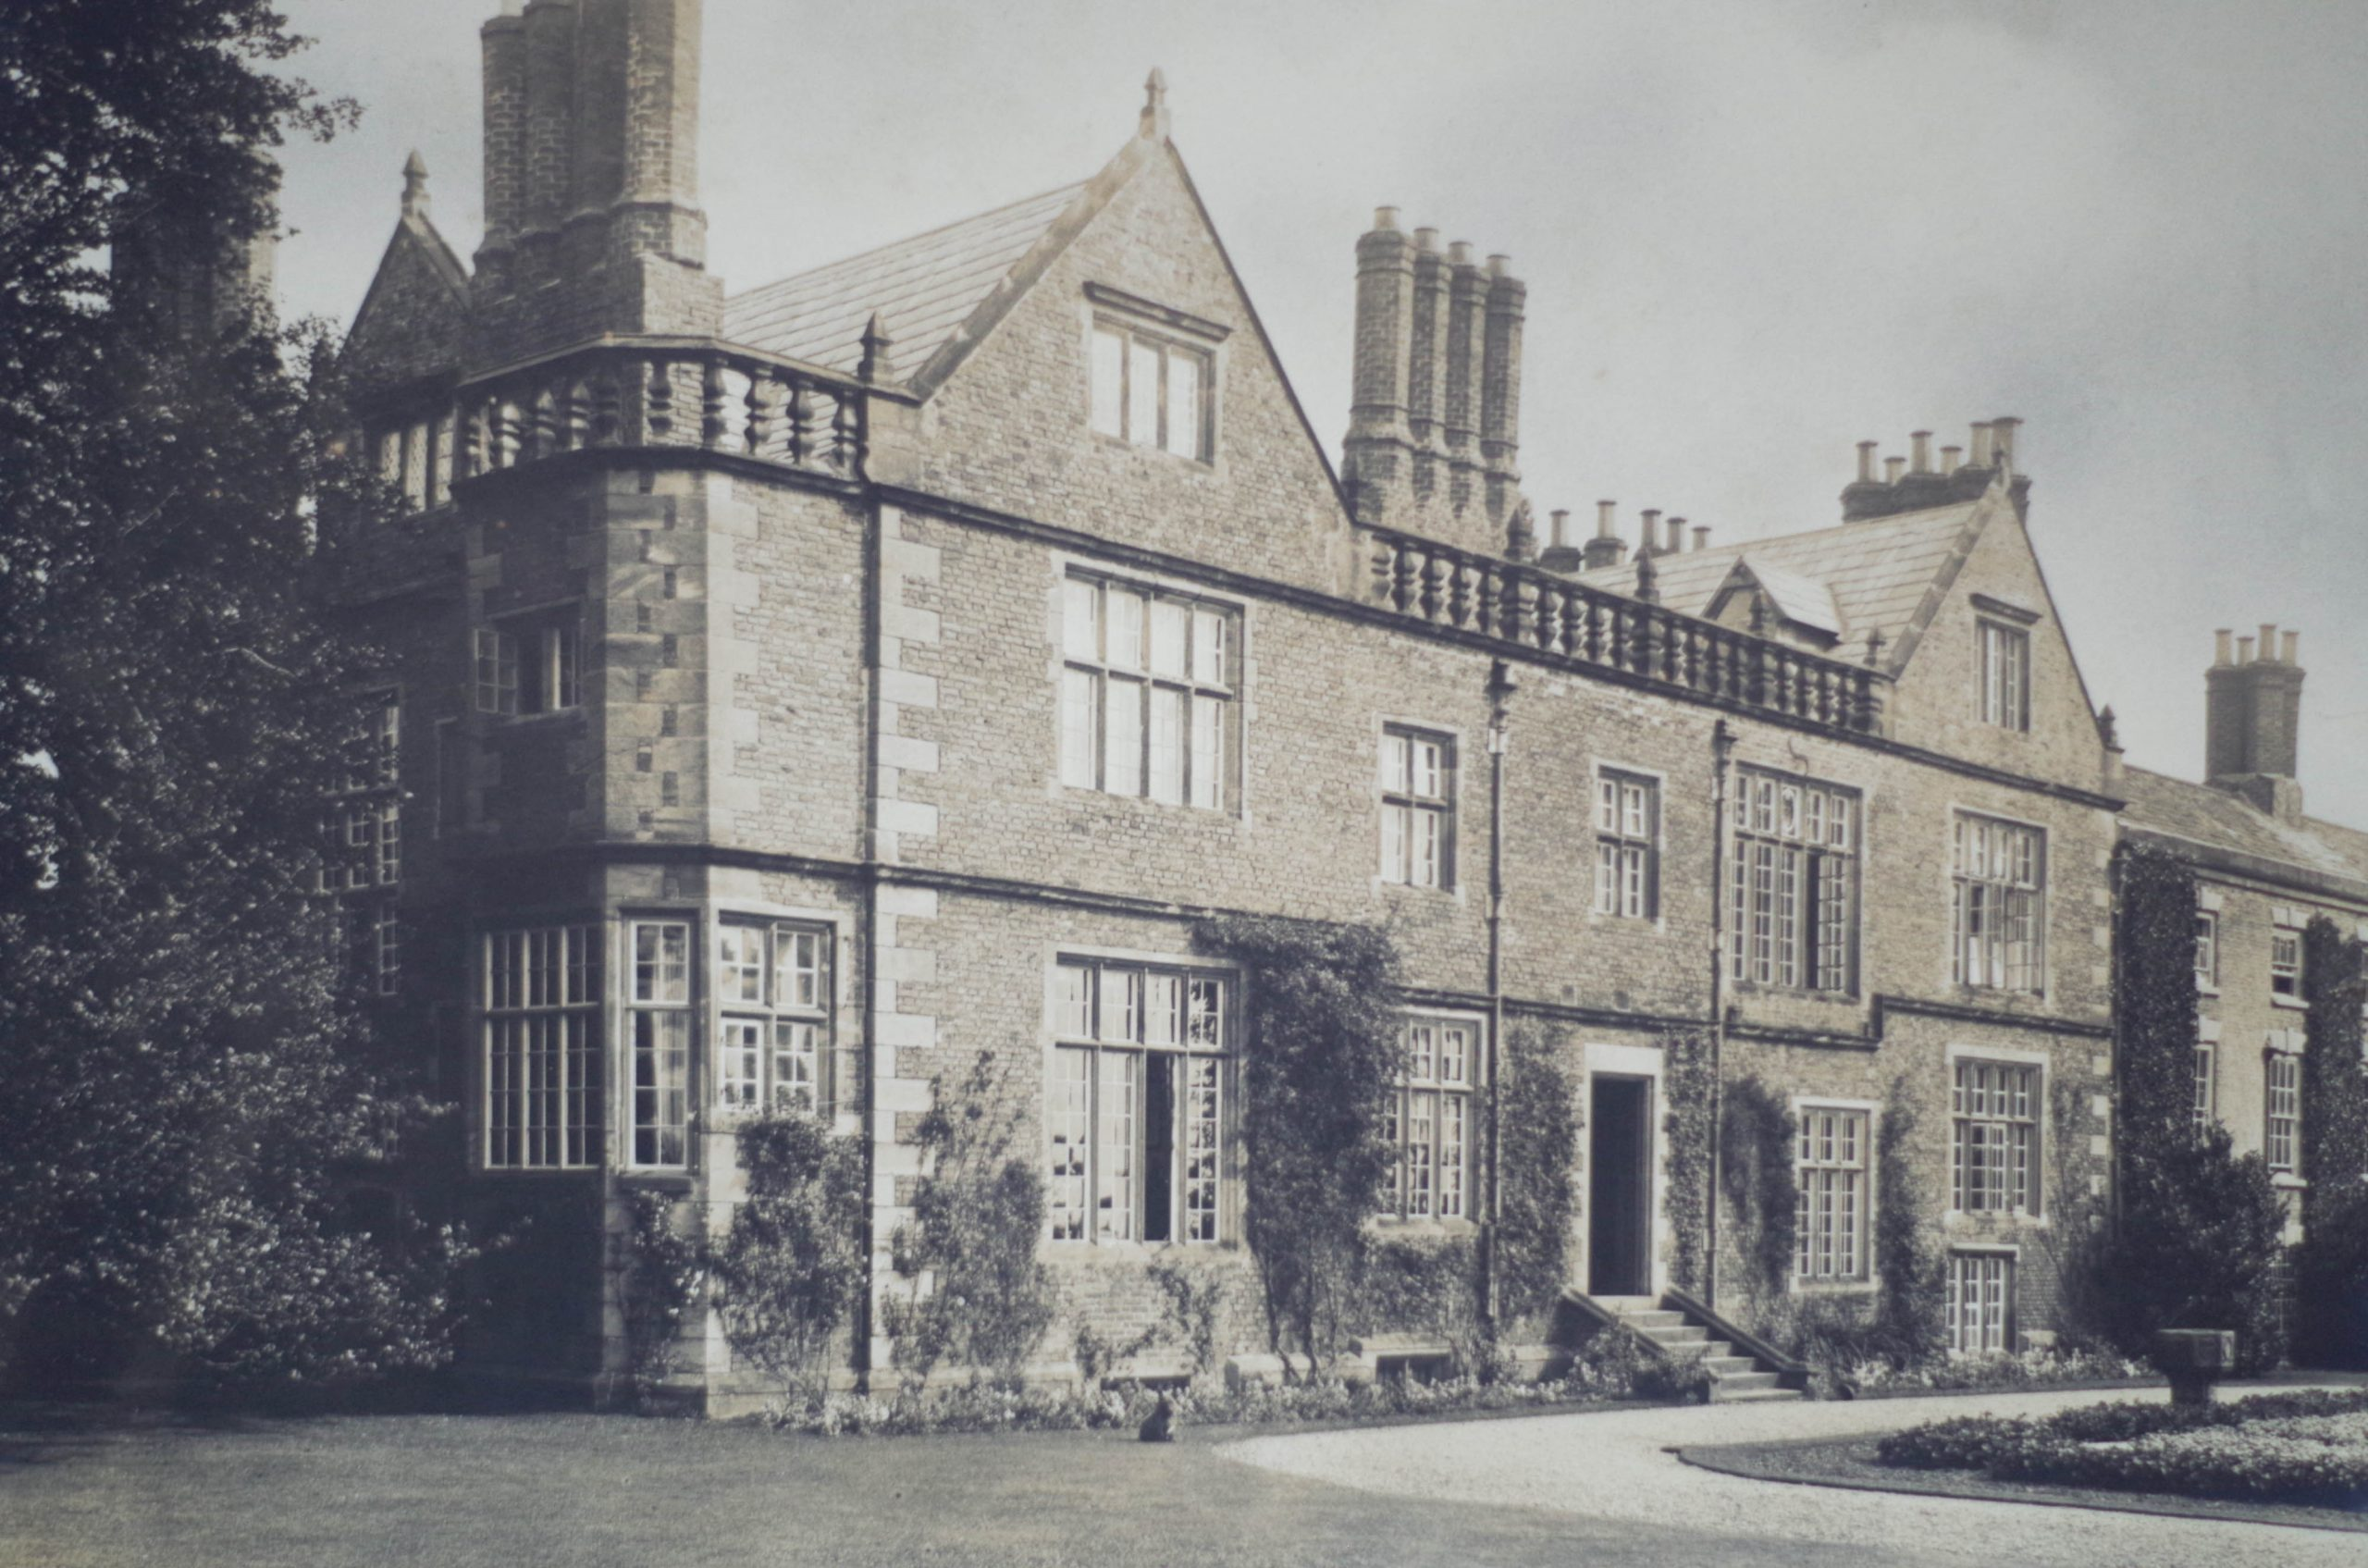 History of Dorfold Hall